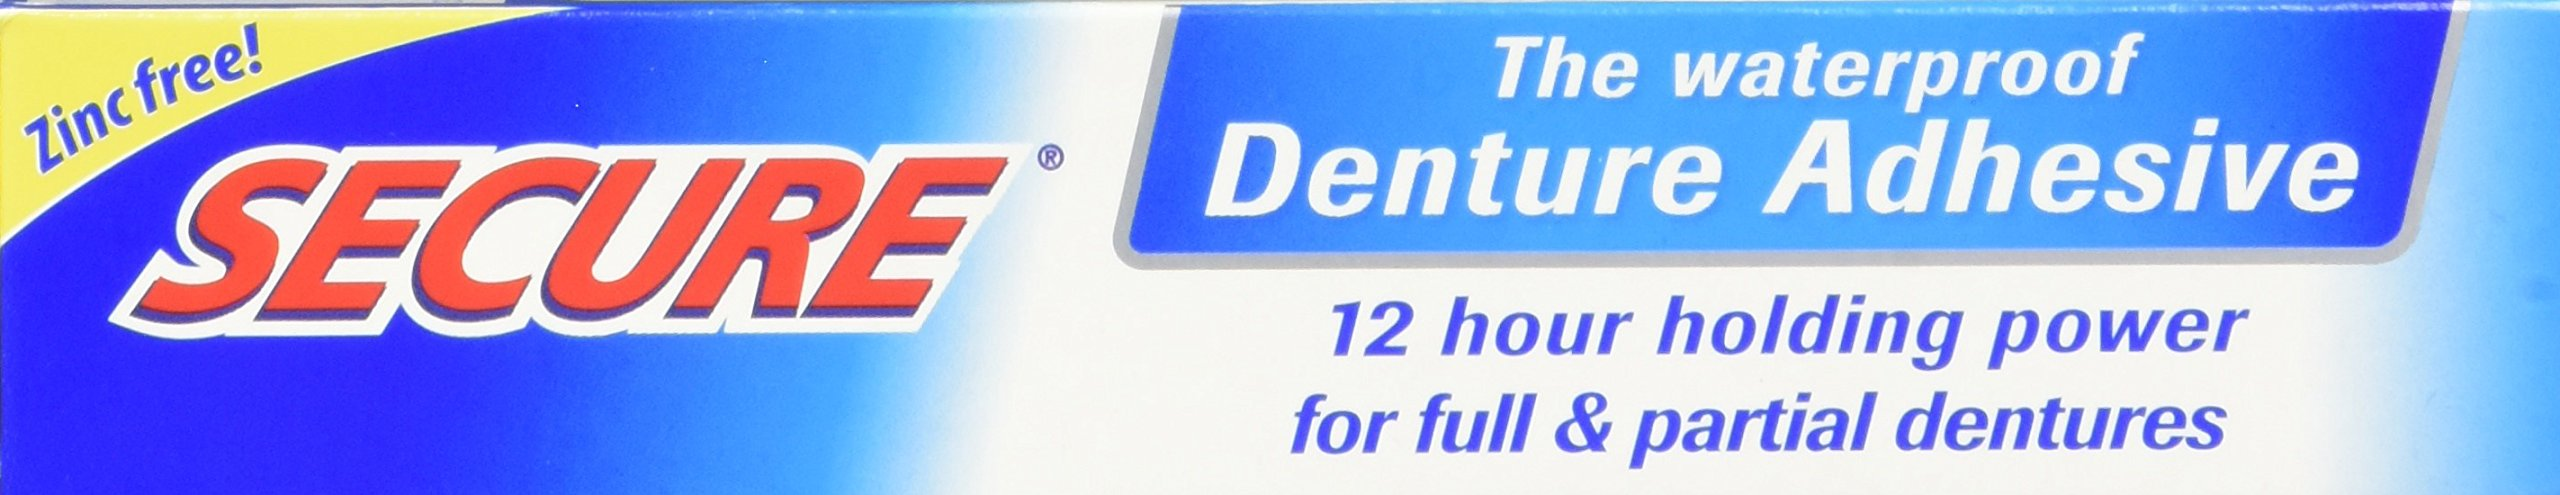 Amazon perma soft denture reliner kit reline 2 denture plates secure denture bonding cream by dentek 14 ounces pack of 4 14 solutioingenieria Image collections